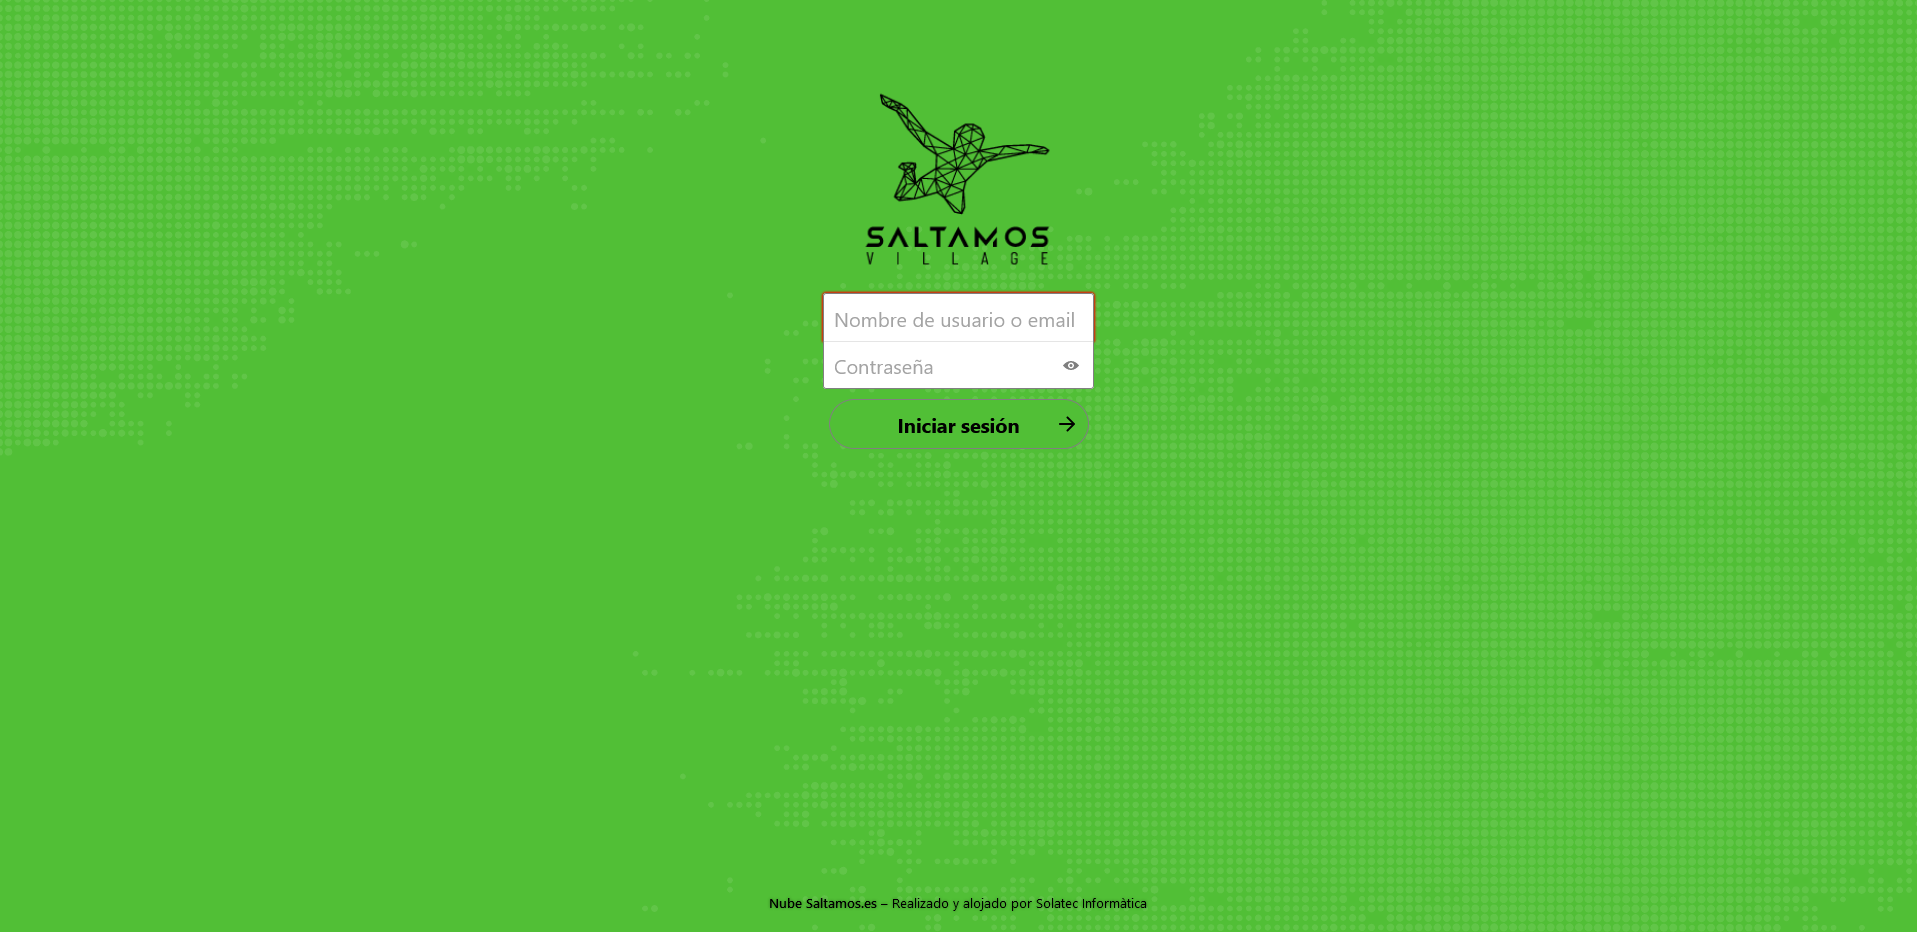 Screenshot_2020-05-02 Nube Saltamos es